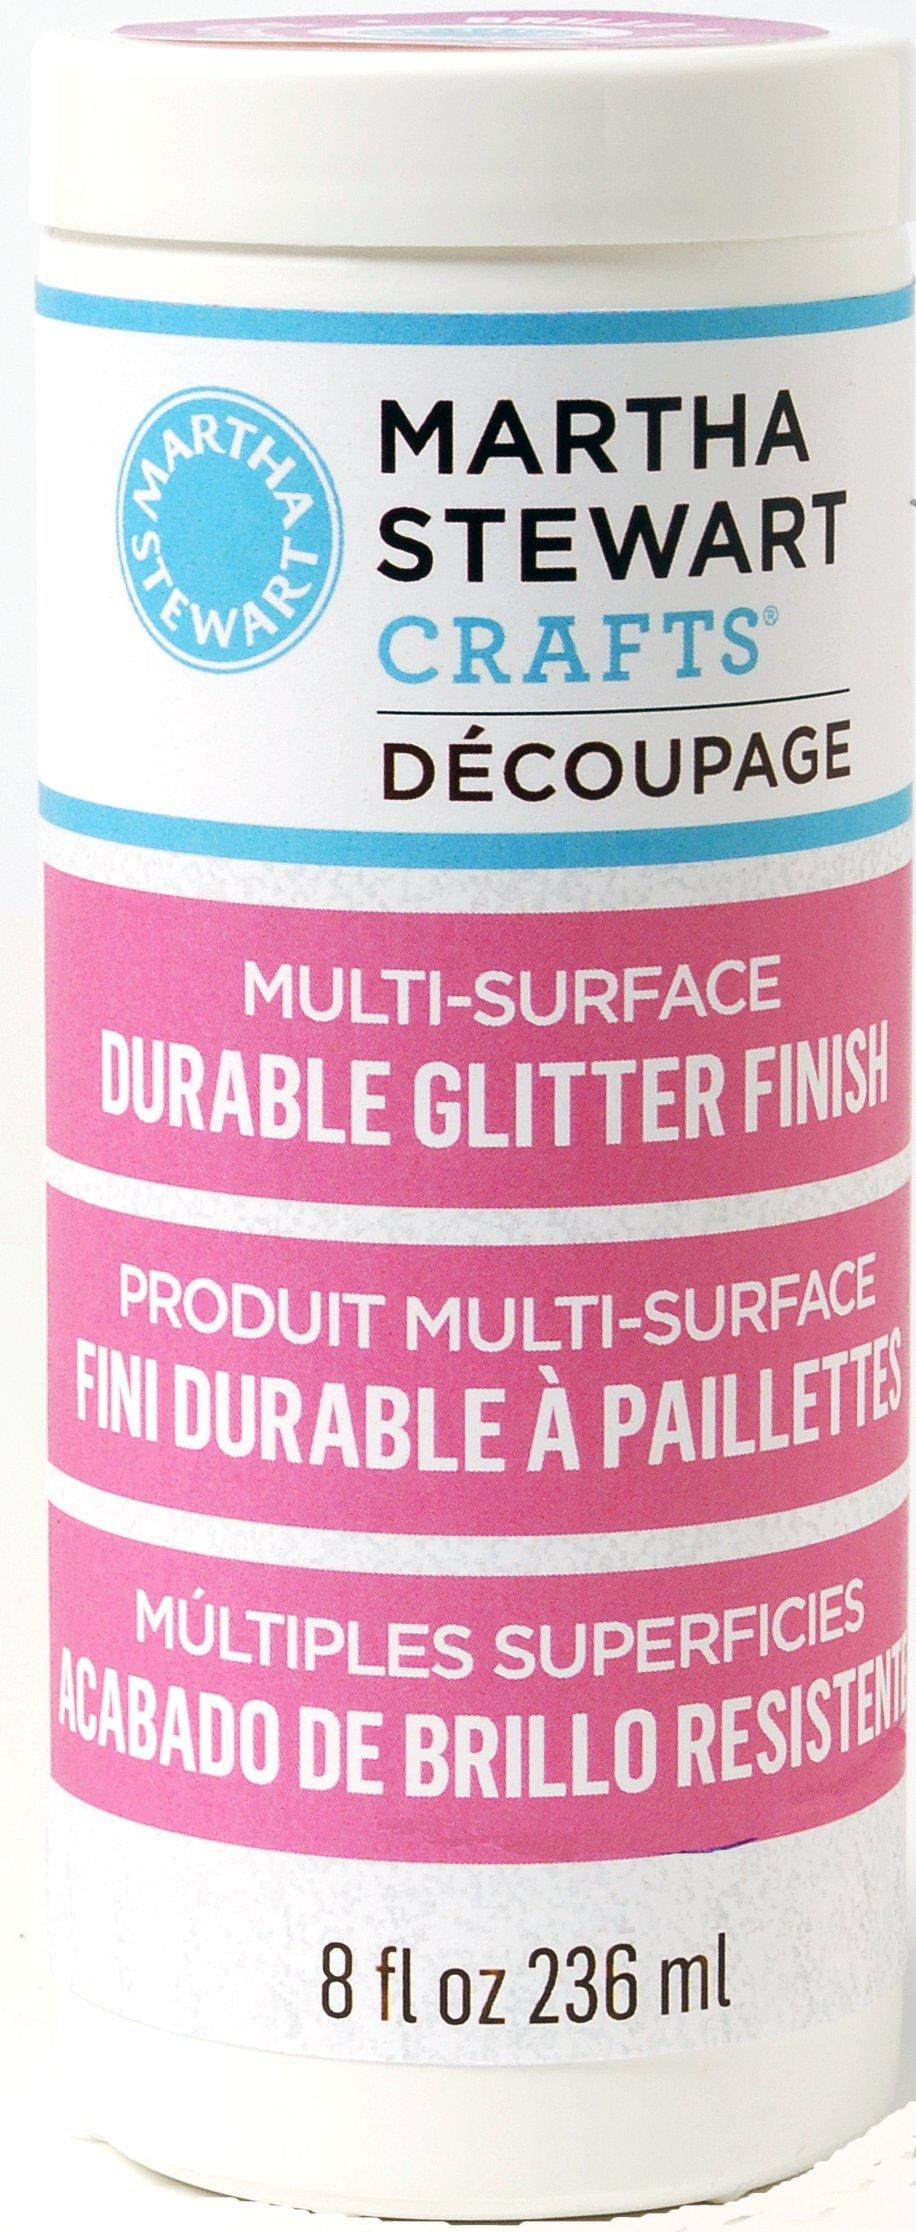 Martha Stewart Crafts Decoupage Formula (8-Ounce), 33288 Glitter Finish